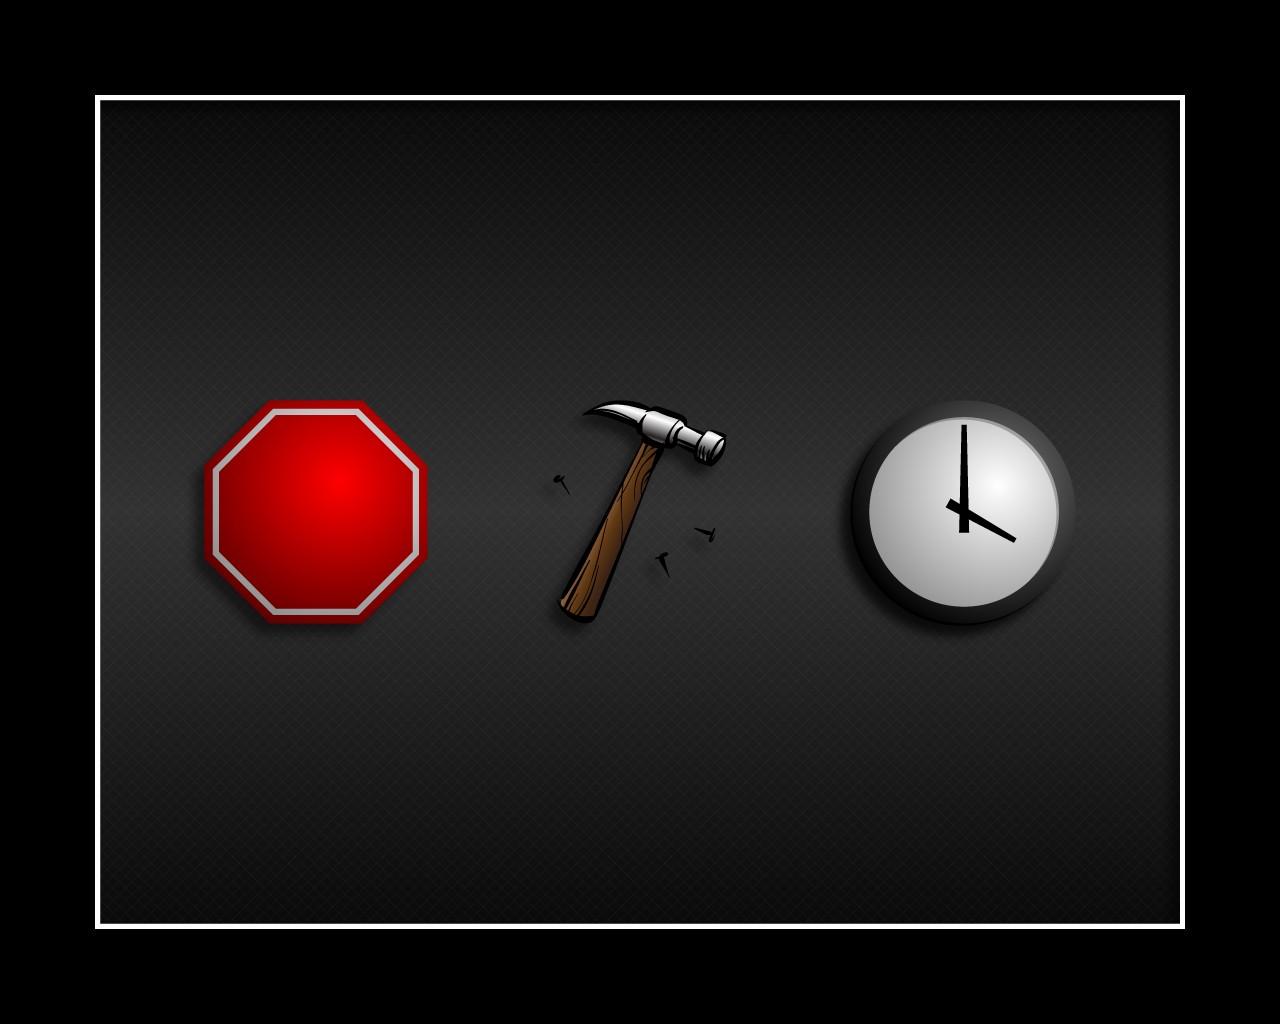 General 1280x1024 hammer stop sign clocks time minimalism songs music humor imagination nails